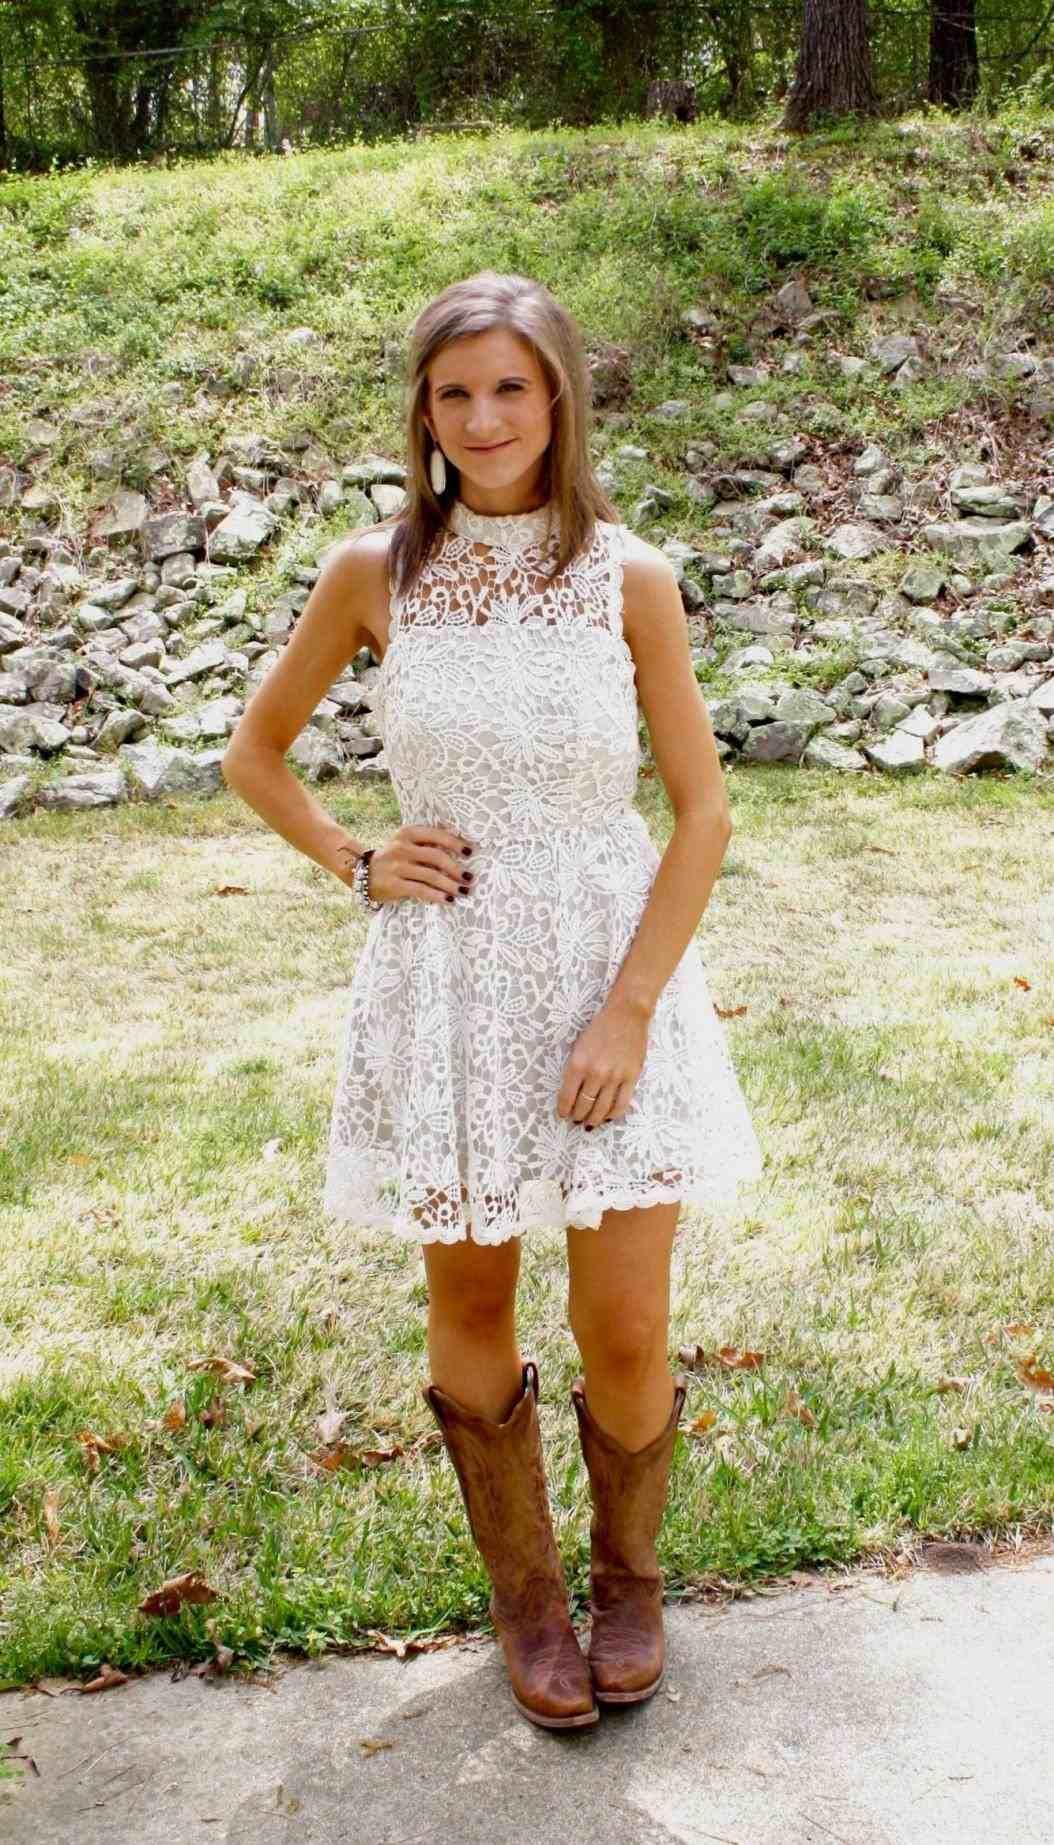 Wedbridal Site Lace Summer Dresses White Lace Summer Dress Wedding Attire Guest [ 1845 x 1054 Pixel ]